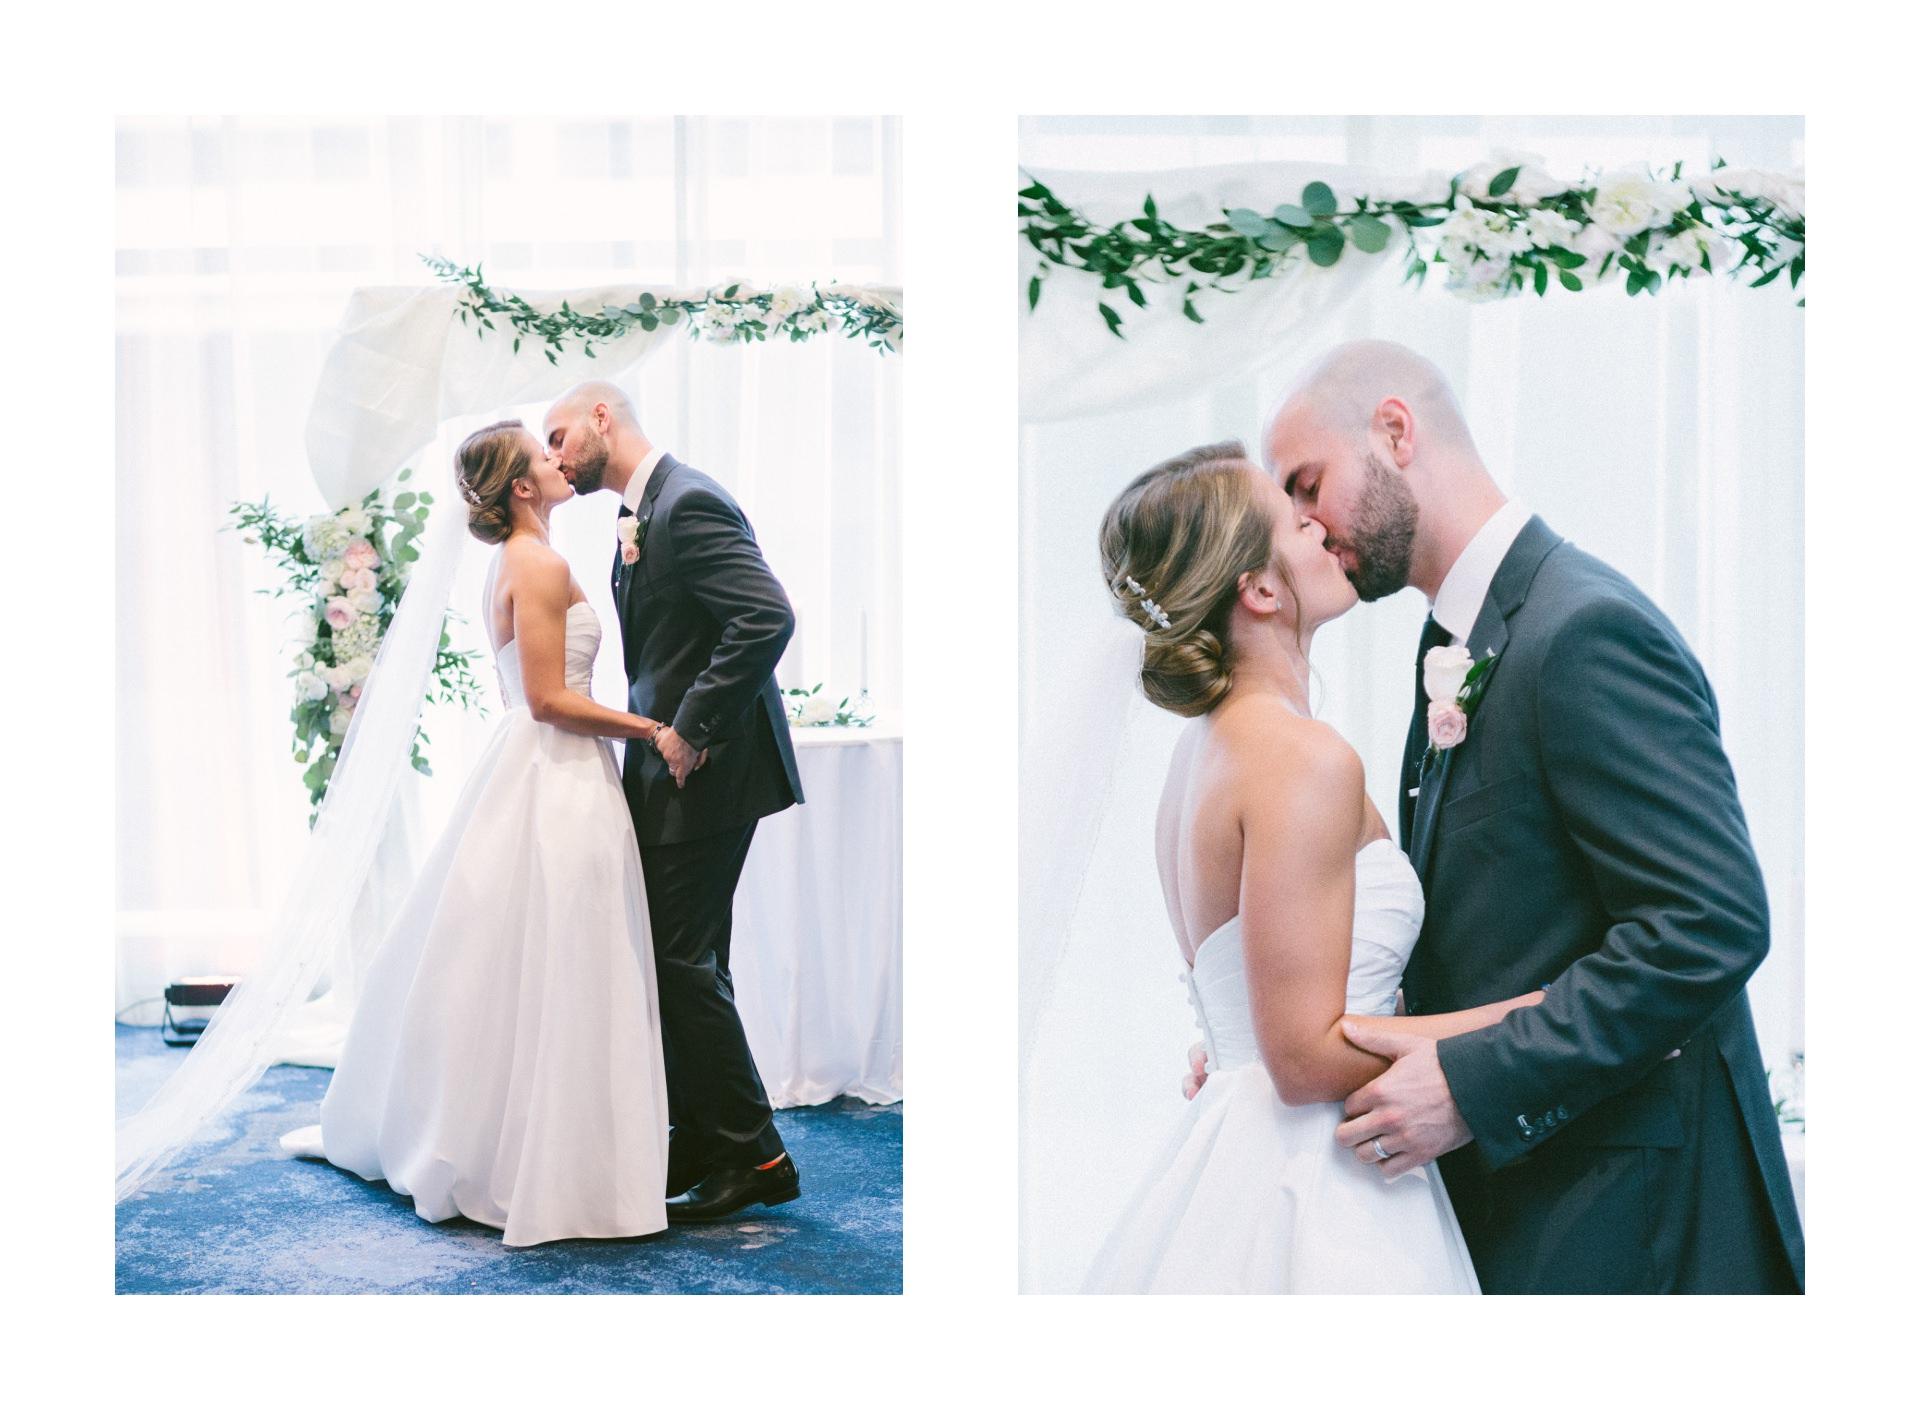 Dowtown Hilton Cleveland Wedding Photographer 2 15.jpg